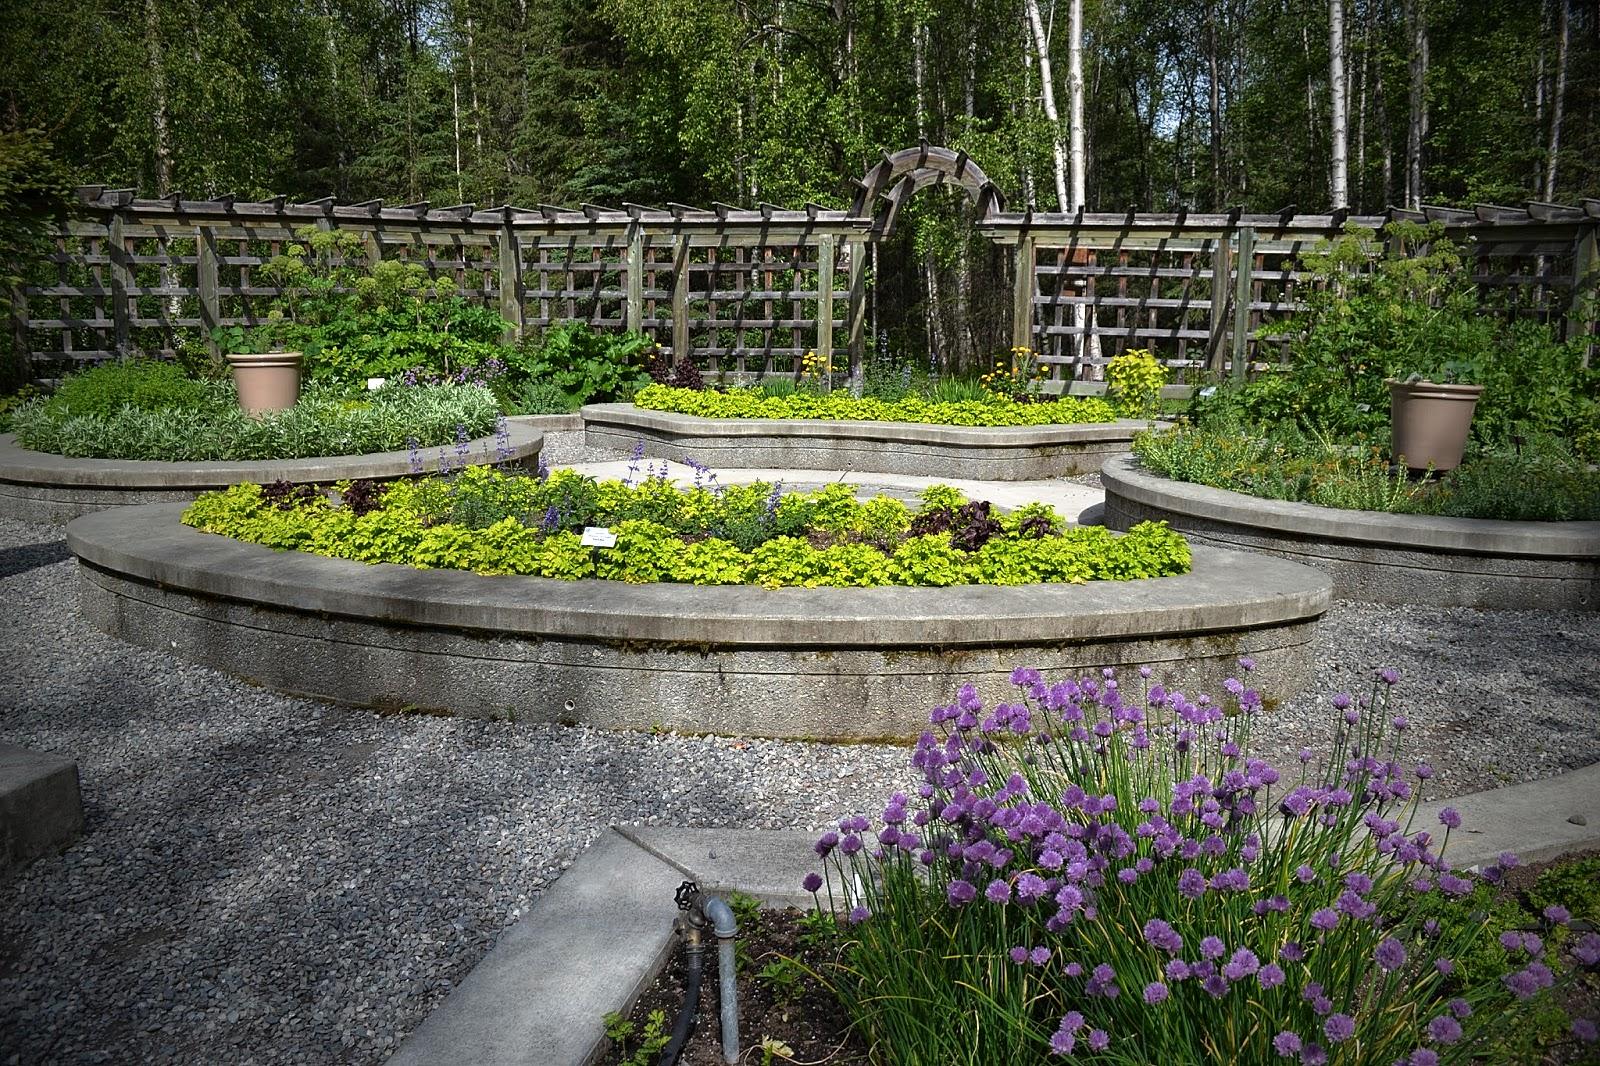 The Outlaw Gardener The Alaska Botanical Garden Part Two